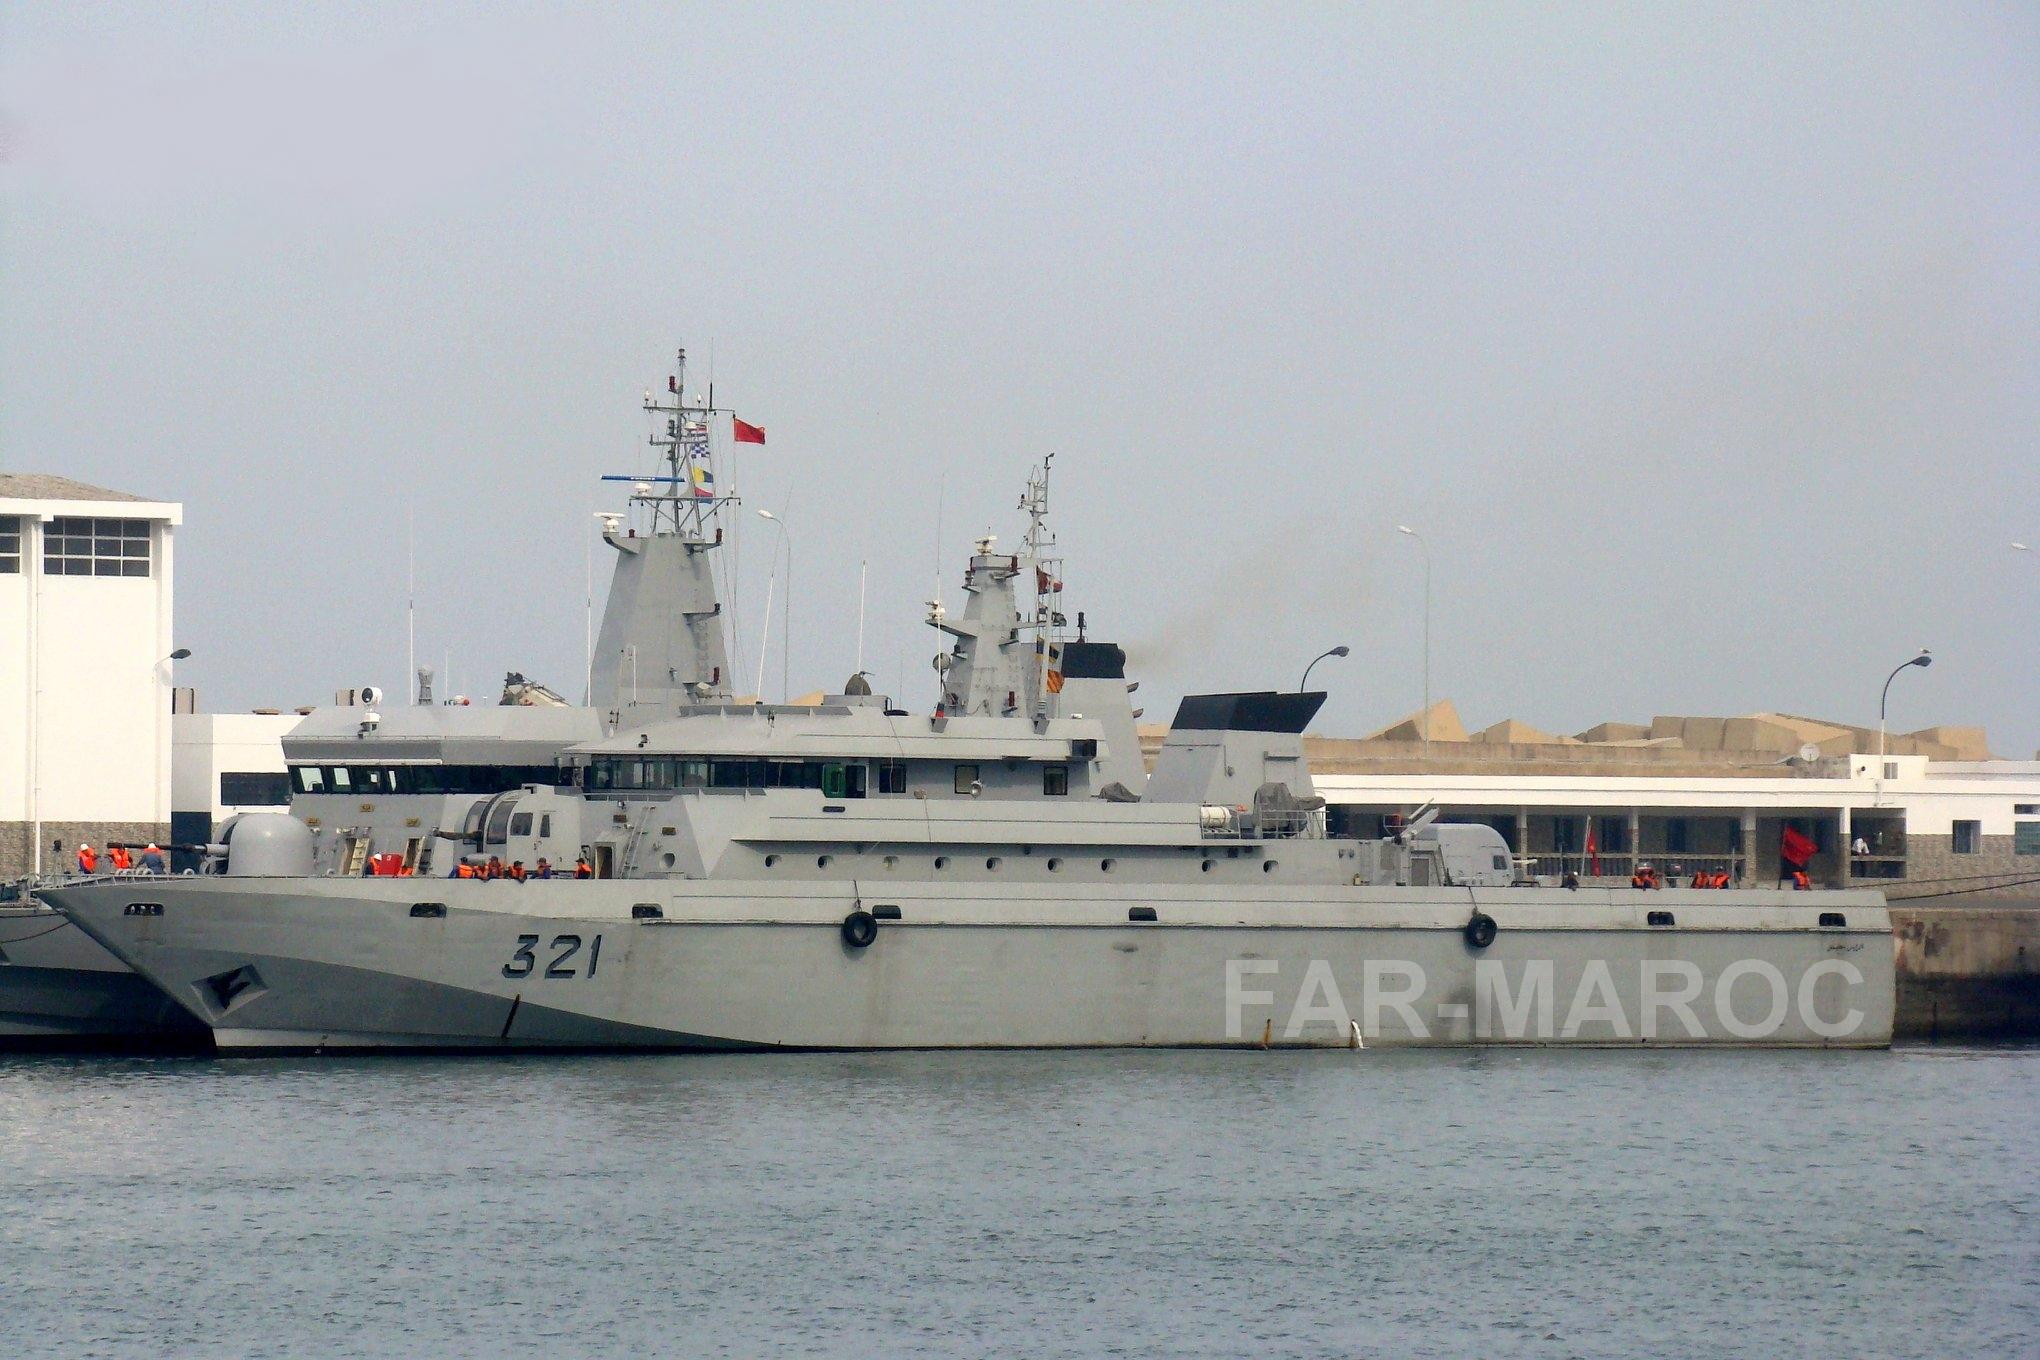 Royal Moroccan Navy Patrol Boats / Patrouilleurs de la Marine Marocaine - Page 14 46790876315_9e4a4da28e_o